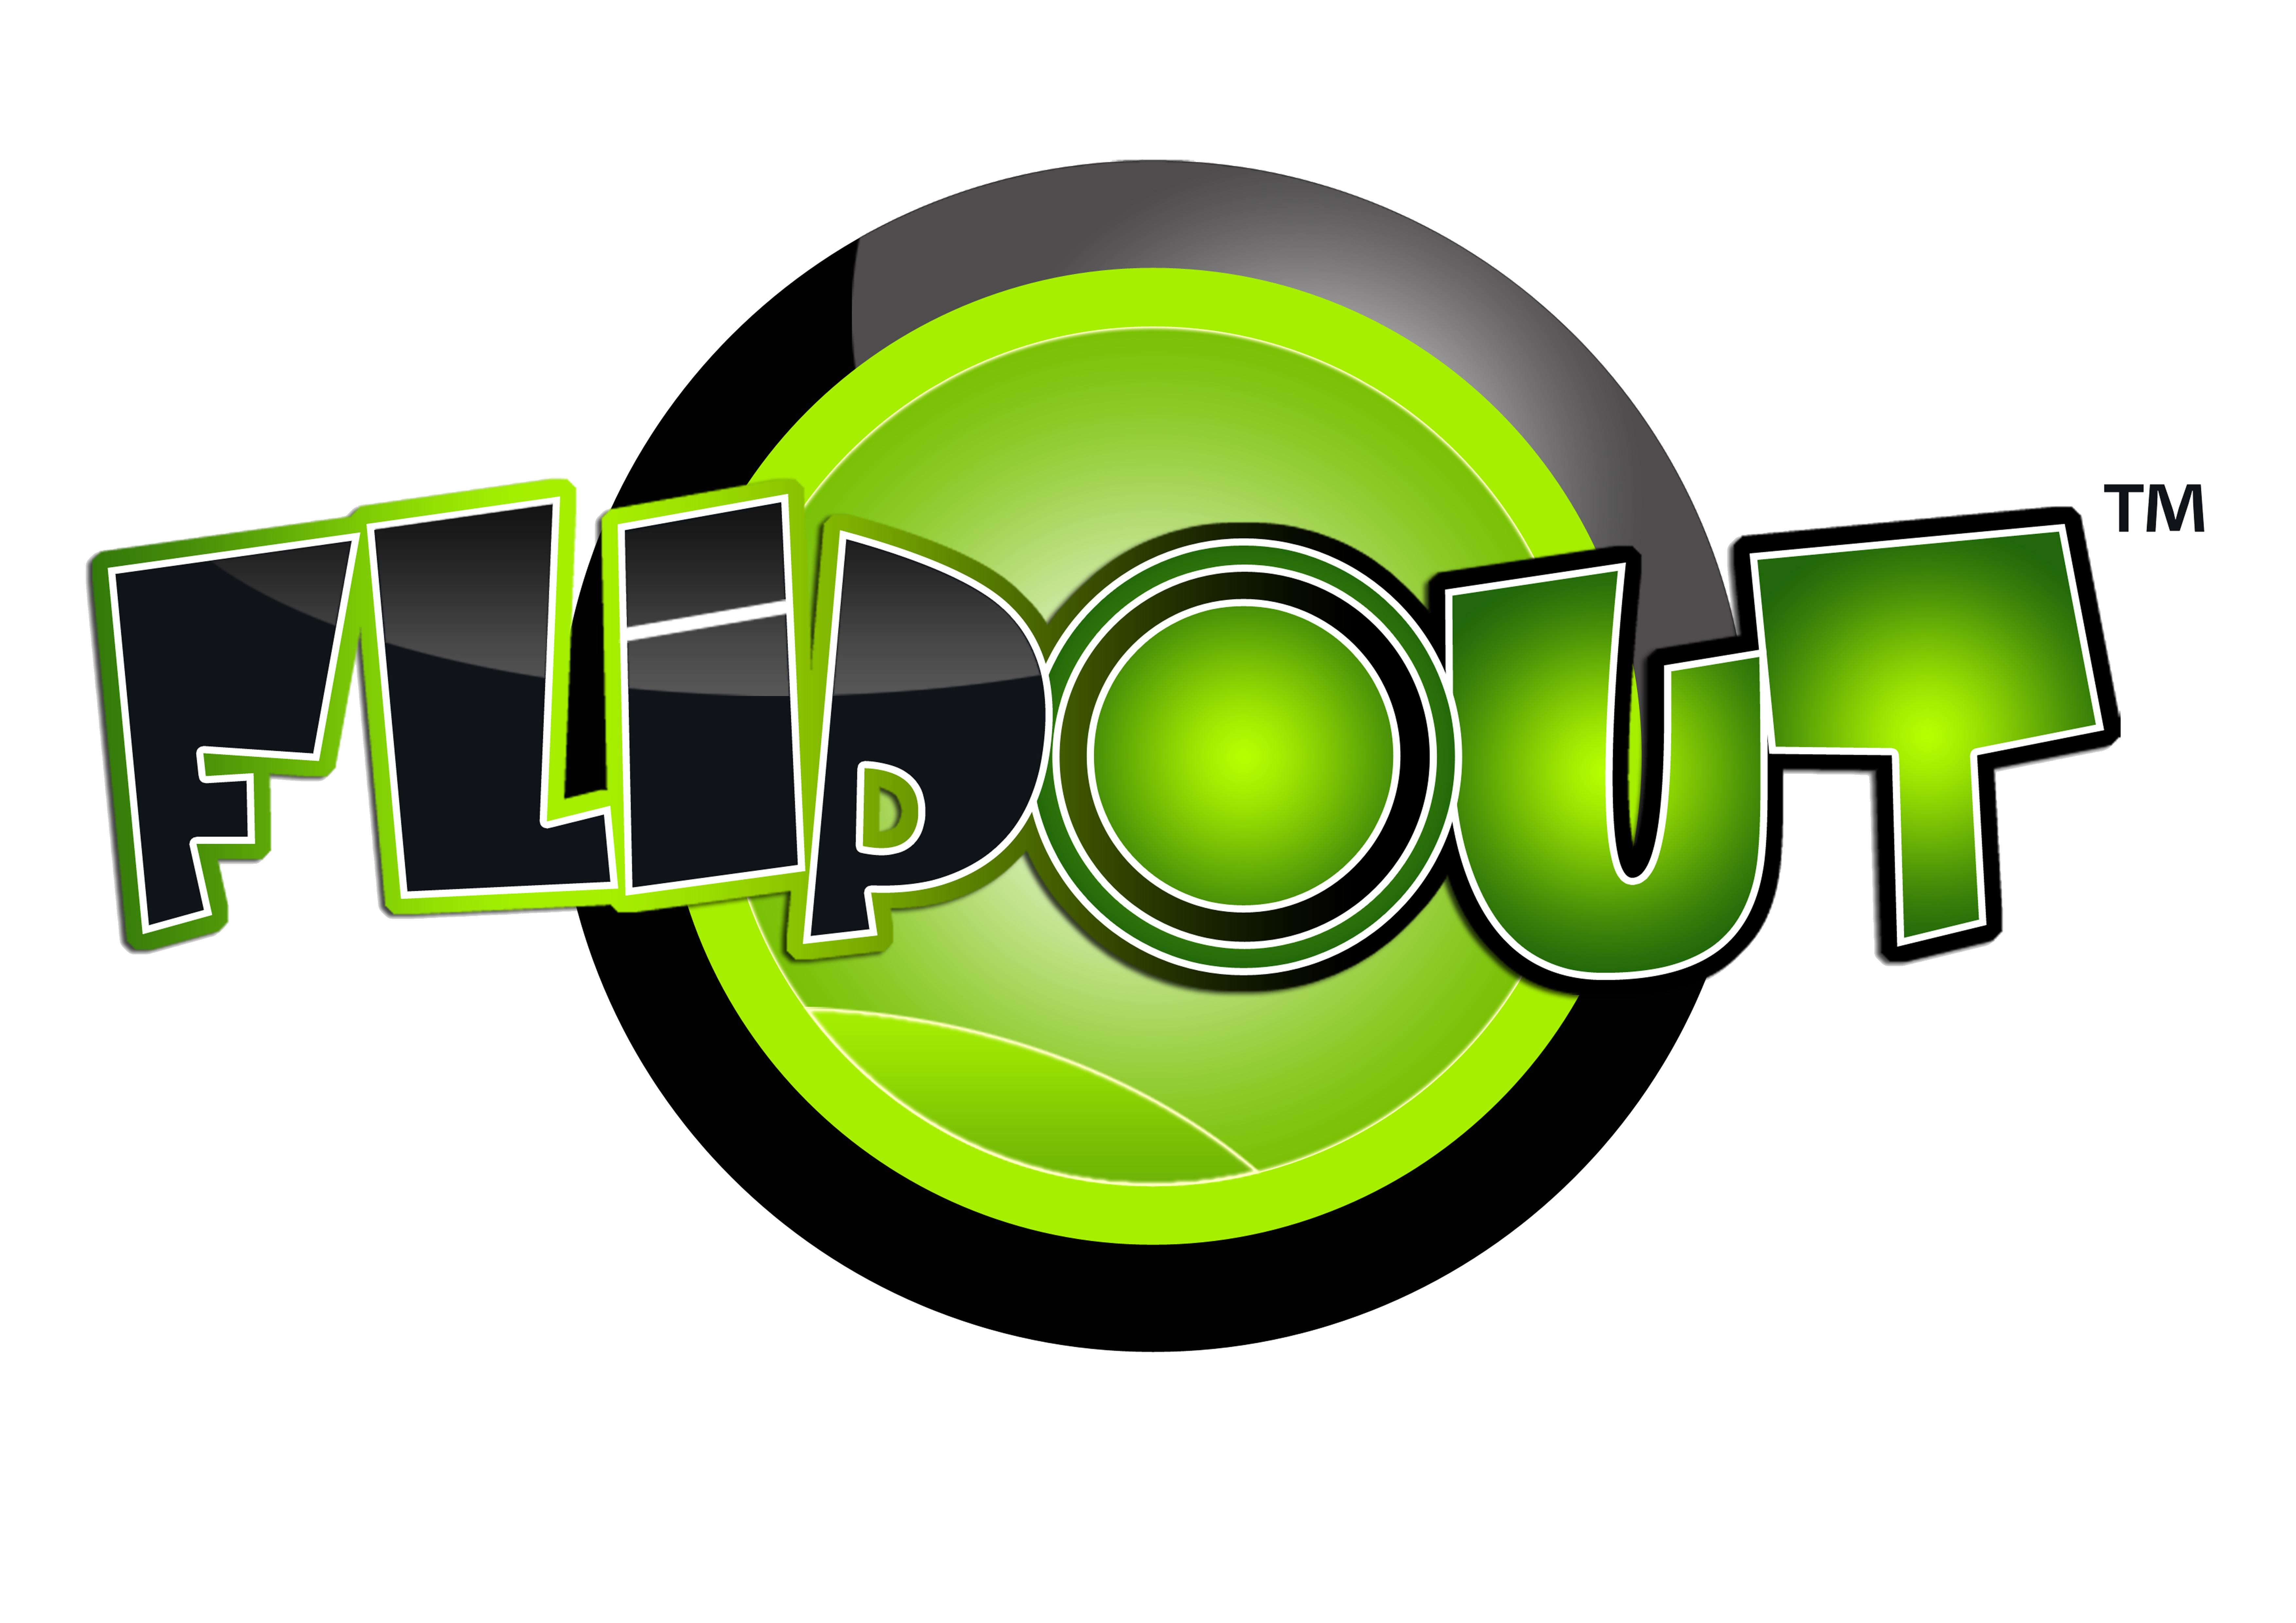 flipout logo hQ :: coffsforkids.com